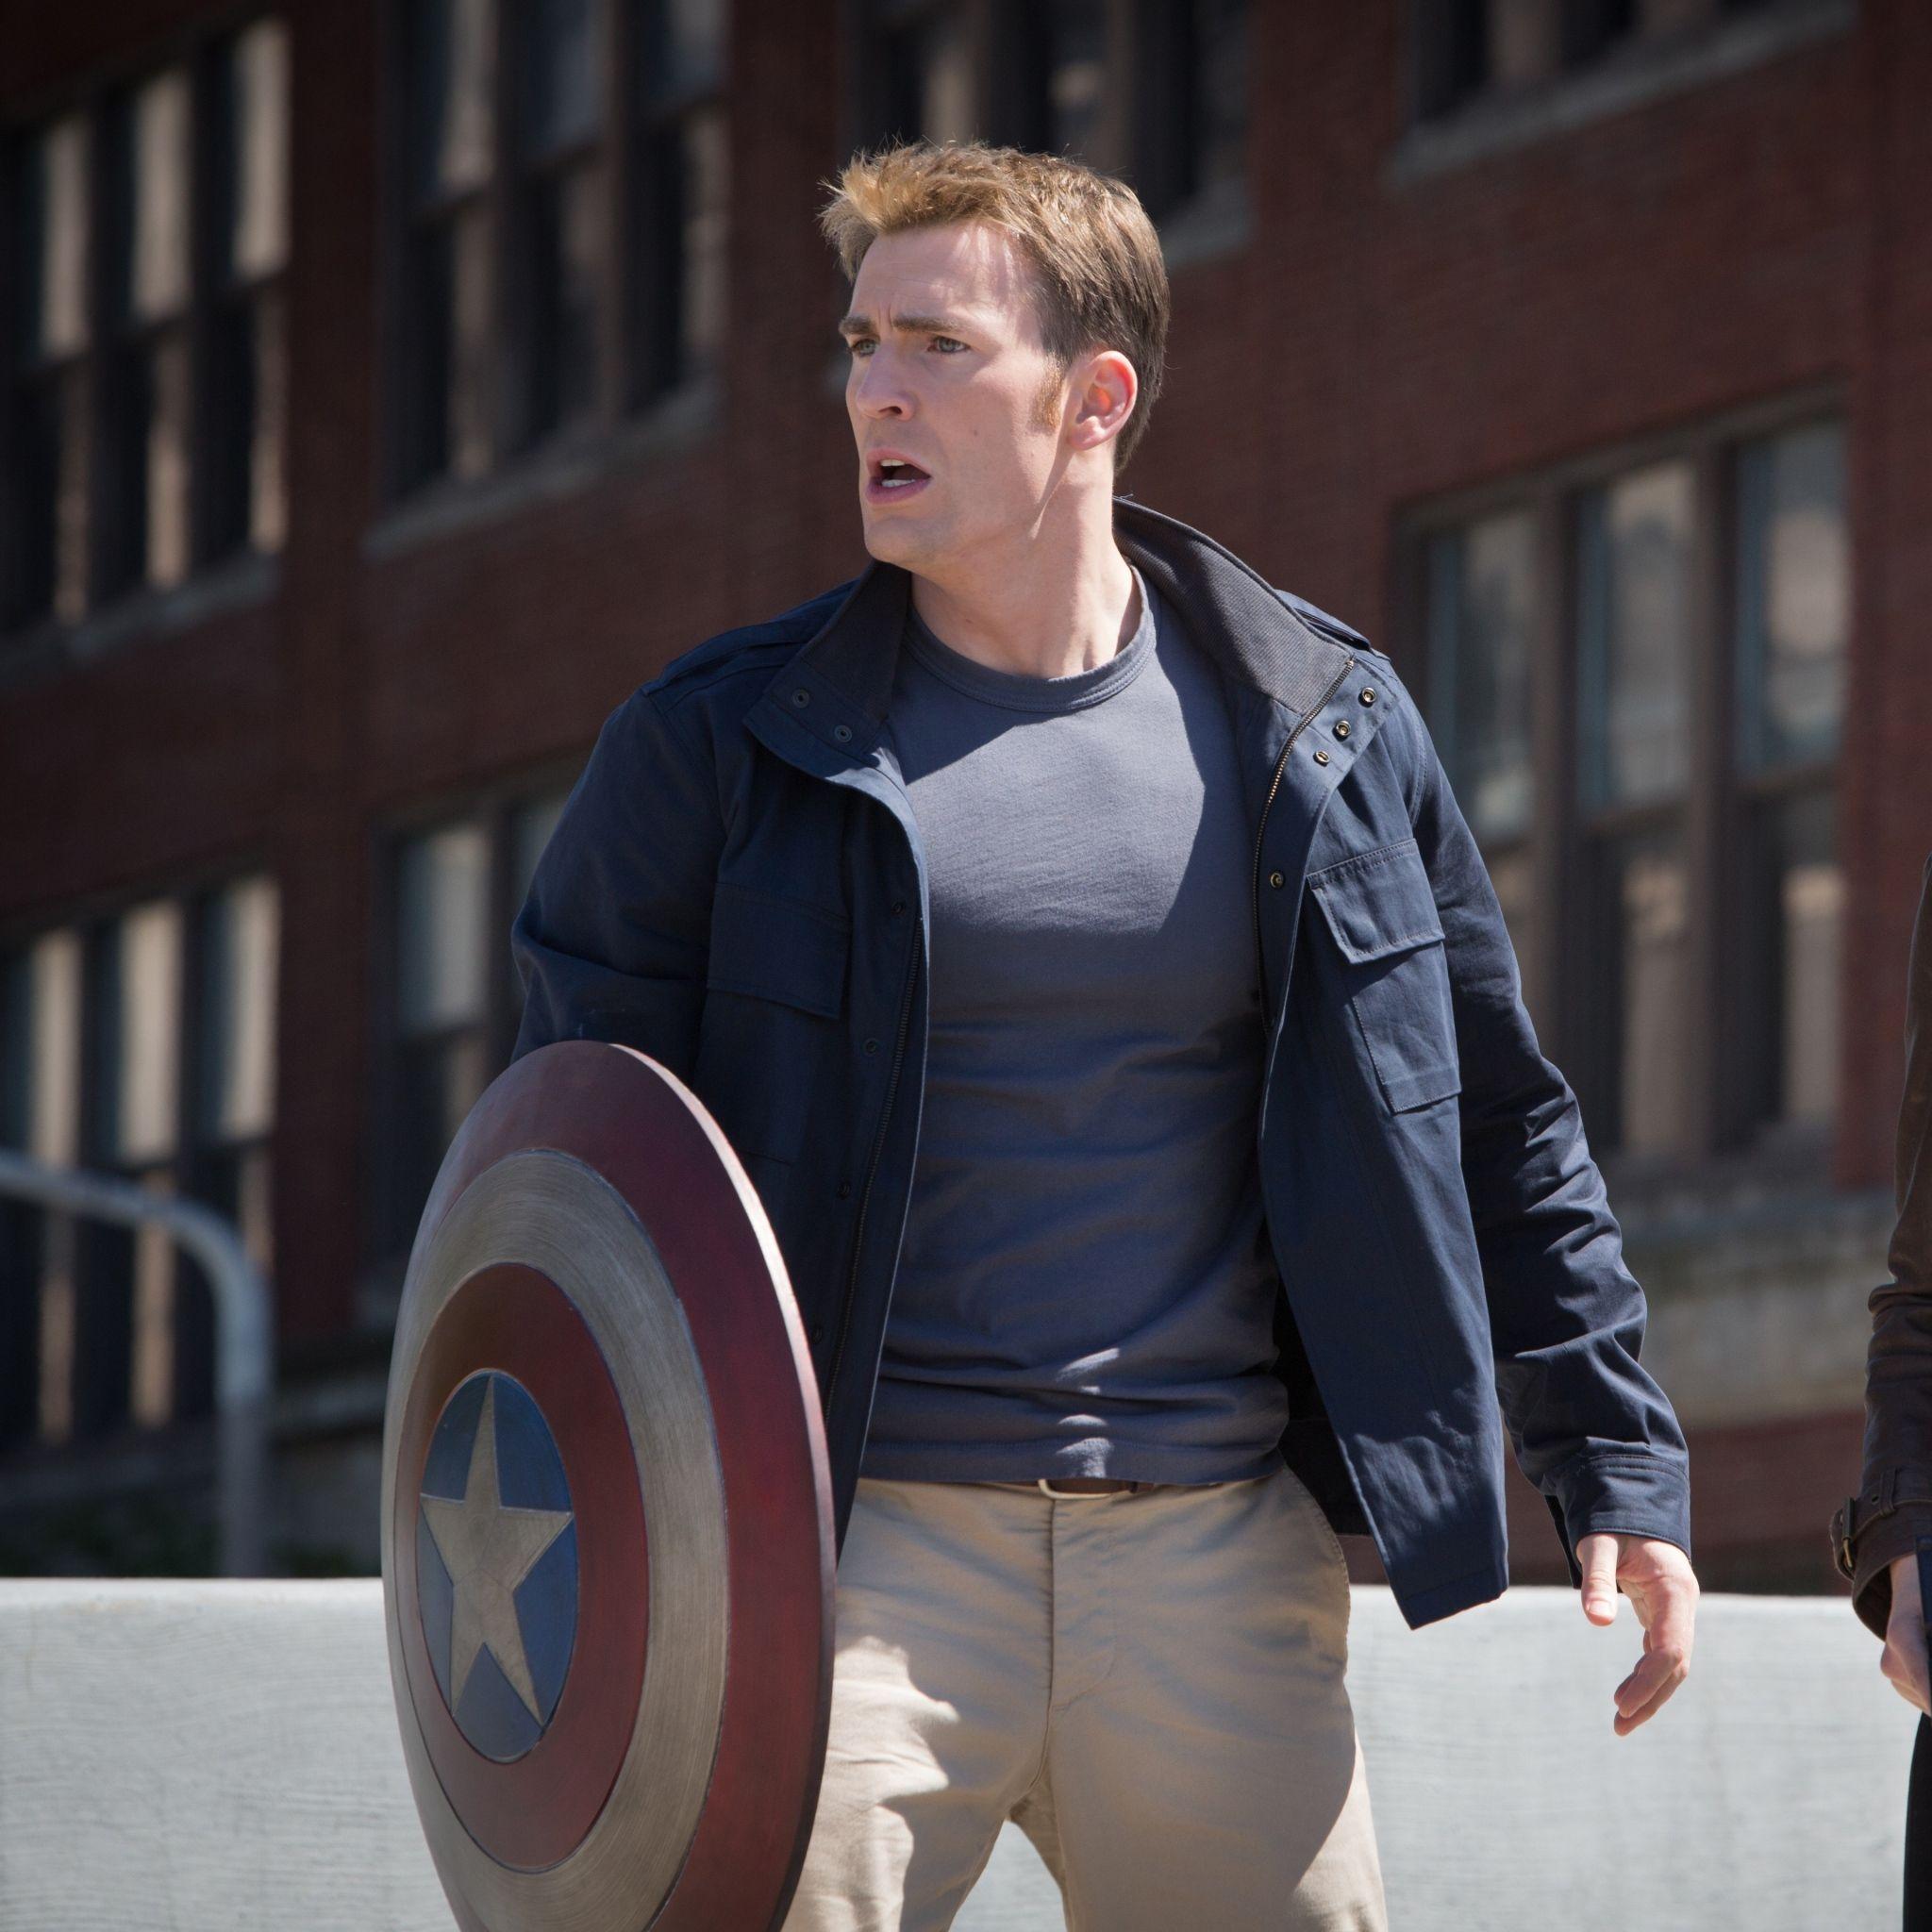 Обои Крис эванс, chris evans, мстители, steve rogers, captain america, the avengers. Фильмы foto 13